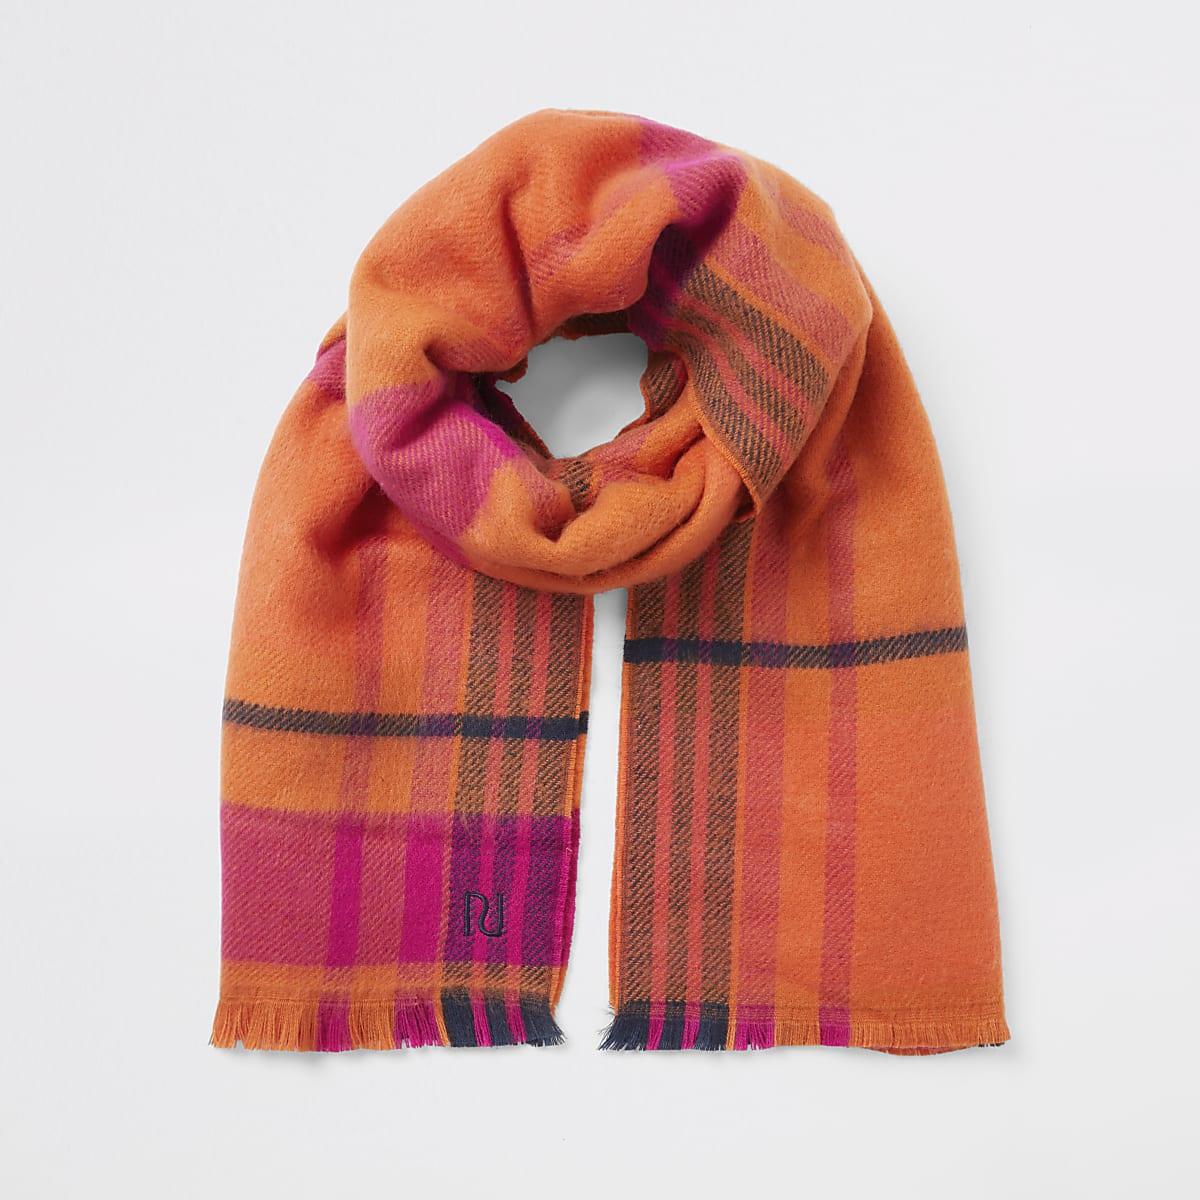 Oranje gebreide geruite RI sjaal